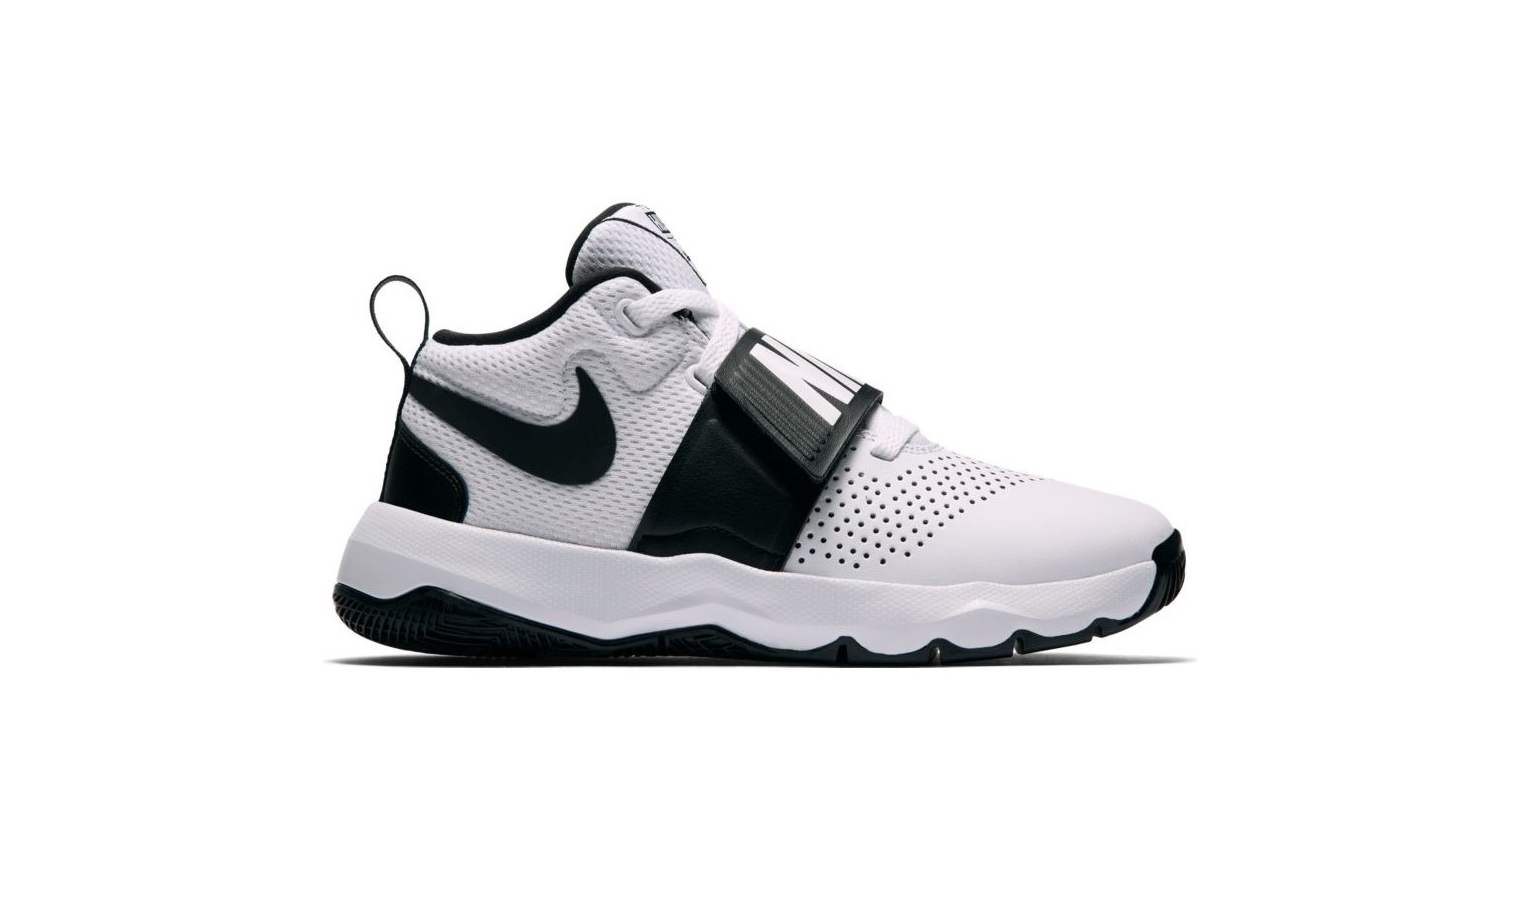 2d181e799e3ac Detské basketbalové topánky Nike TEAM HUSTLE D 8 (GS) biele | AD ...